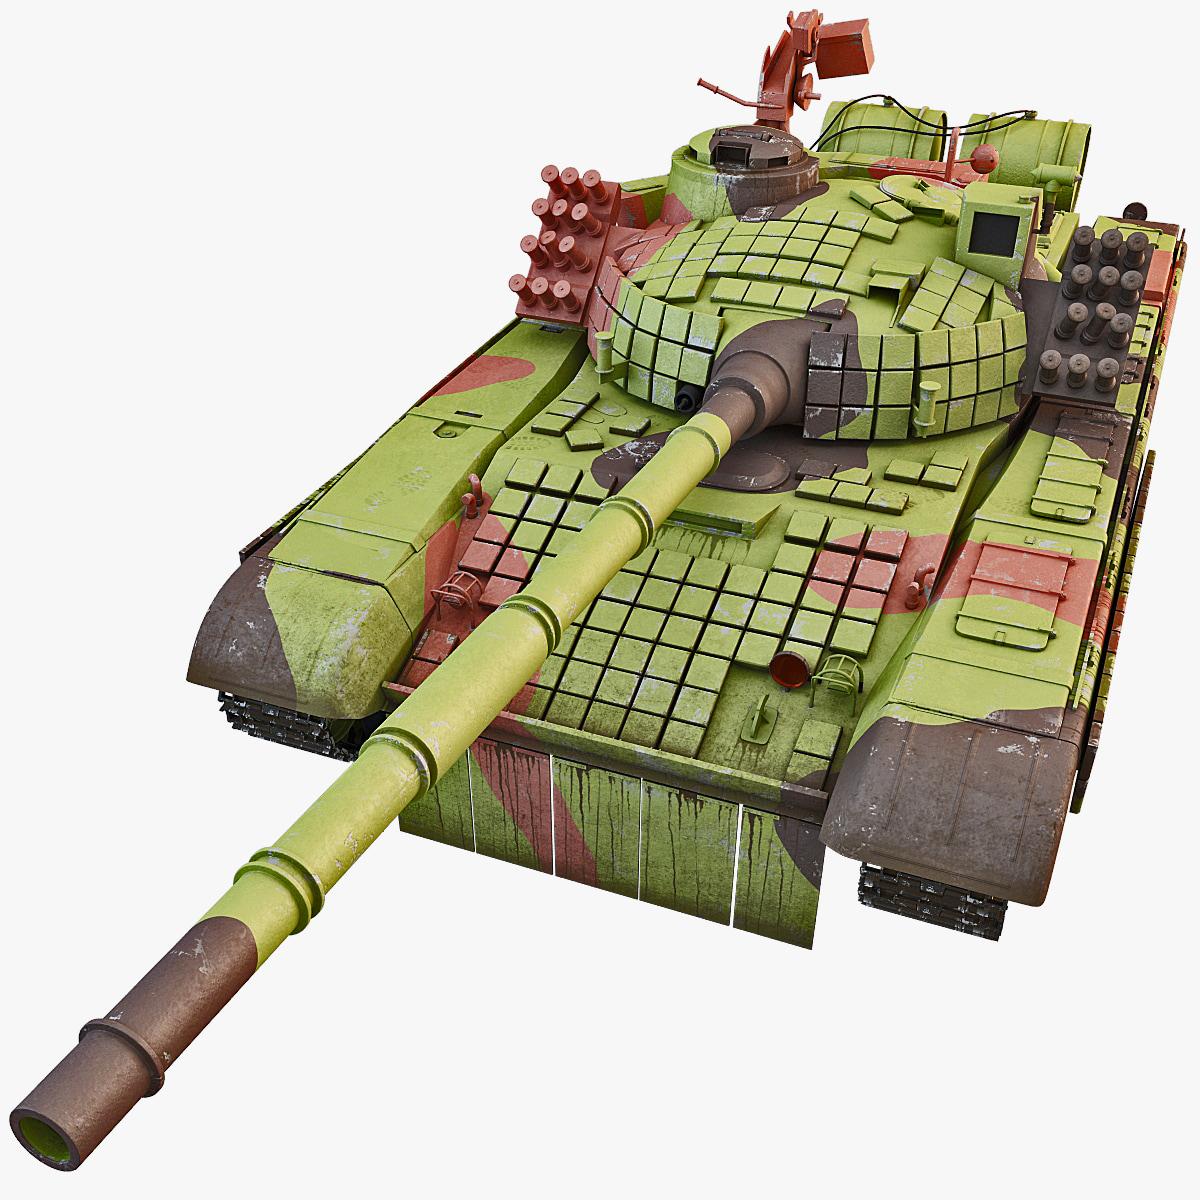 Polish_Main_Battle_Tank_PT-91_Twardy_000.jpg